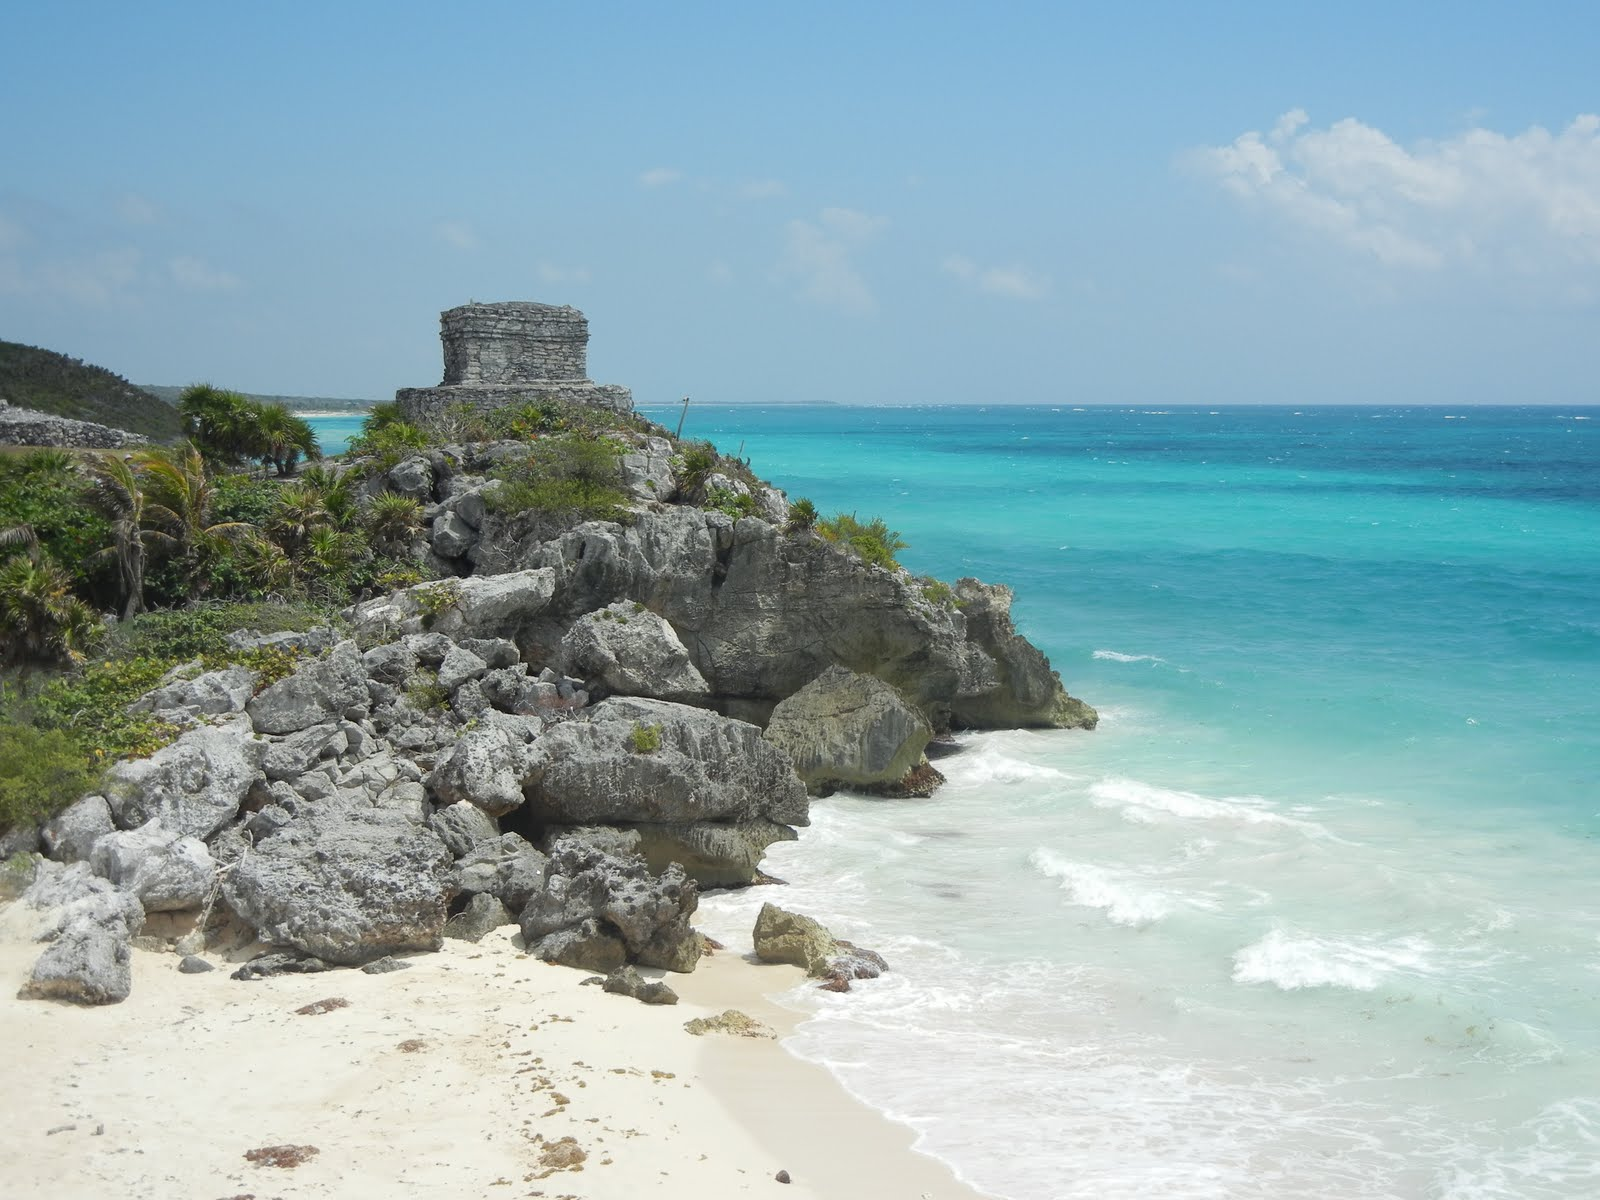 mexiko und guatemala mexiko playa del carmen ein paradies. Black Bedroom Furniture Sets. Home Design Ideas